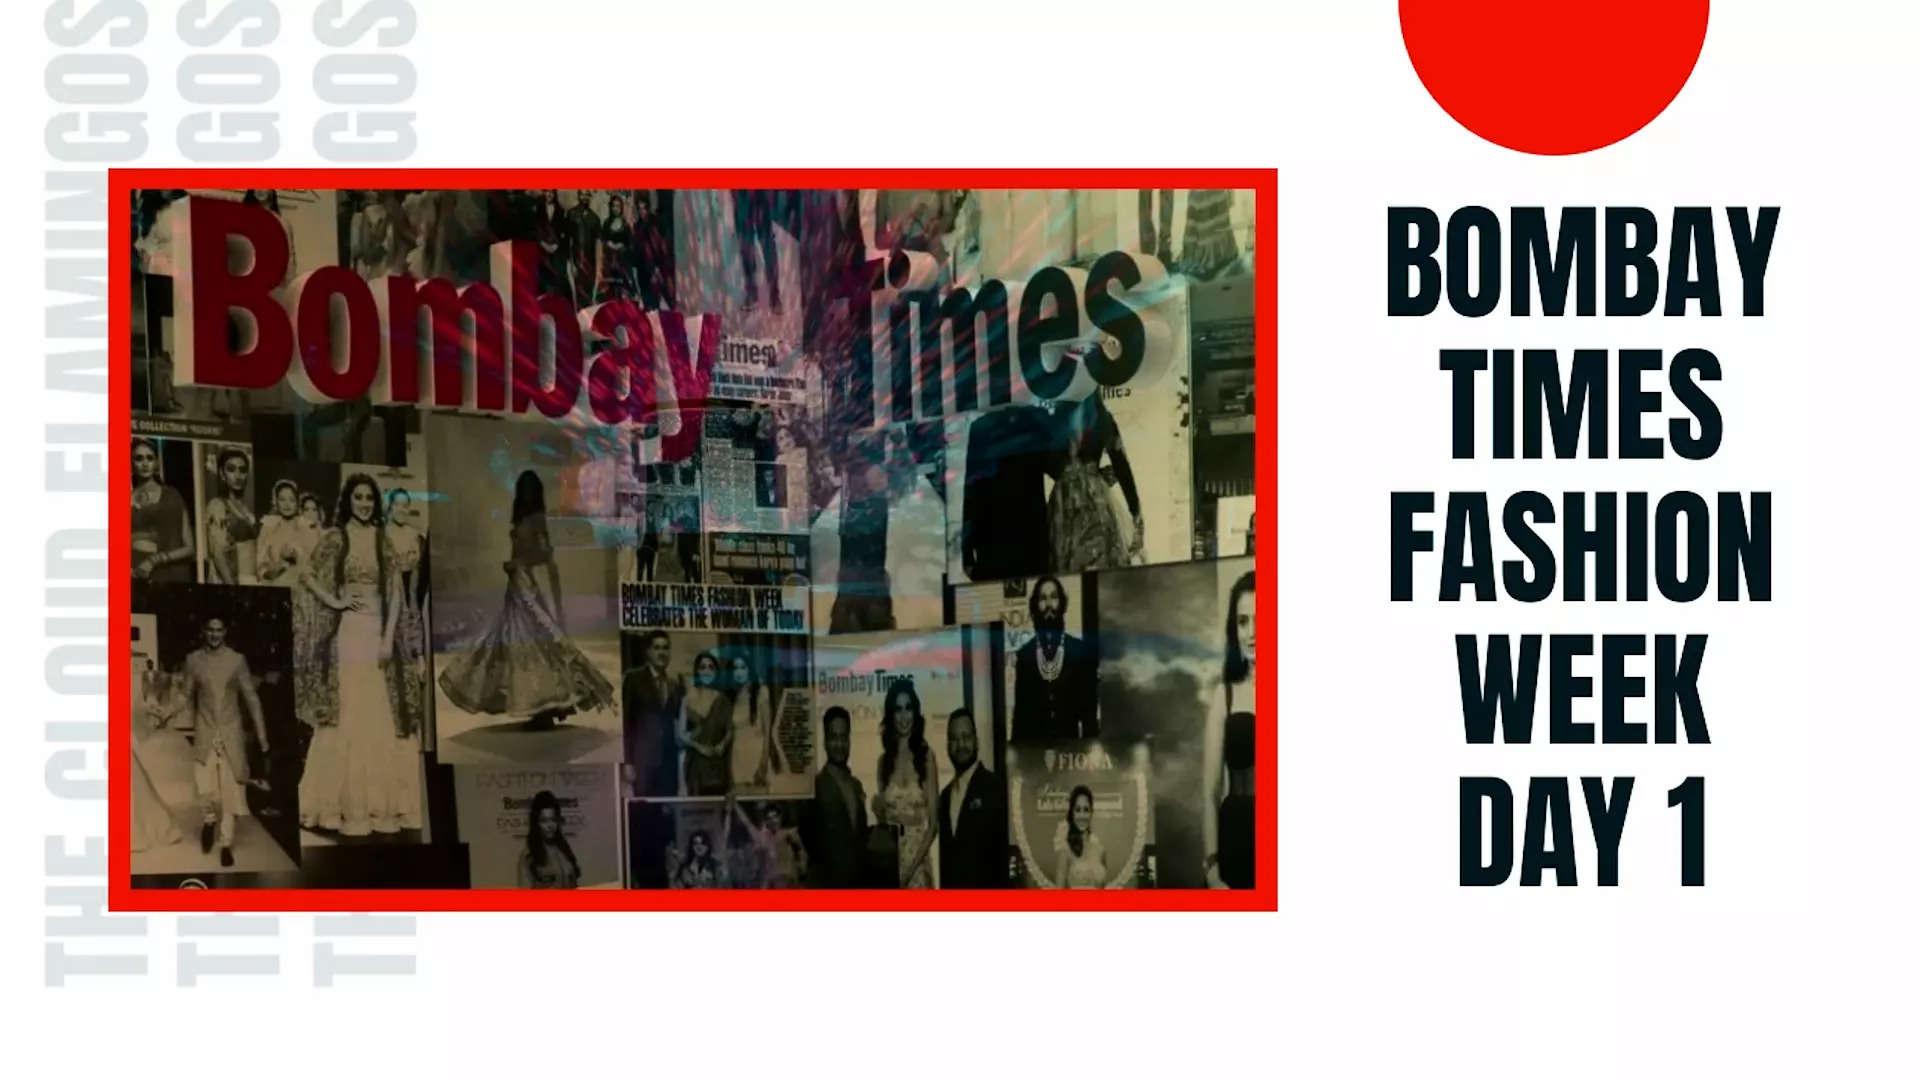 bombay-times-fashion-week-day-1